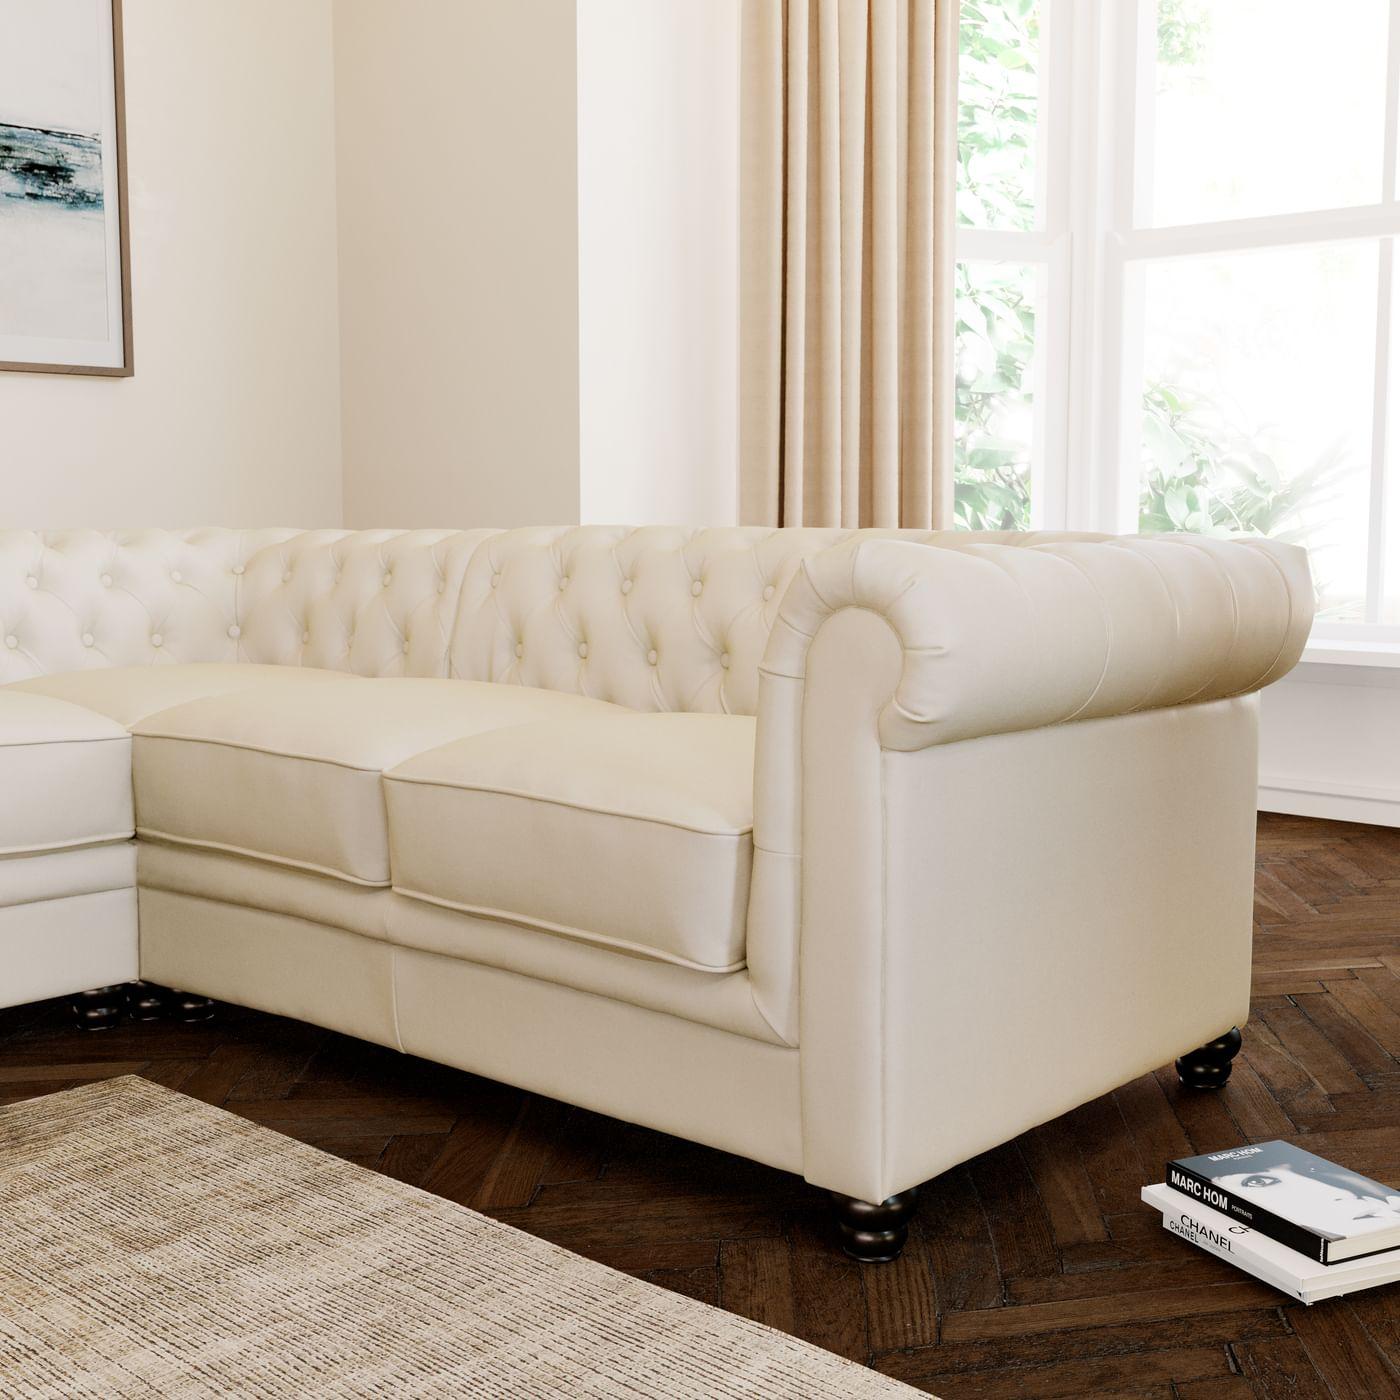 Amazing White Leather Chesterfield Corner Sofa Baci Living Room Inzonedesignstudio Interior Chair Design Inzonedesignstudiocom